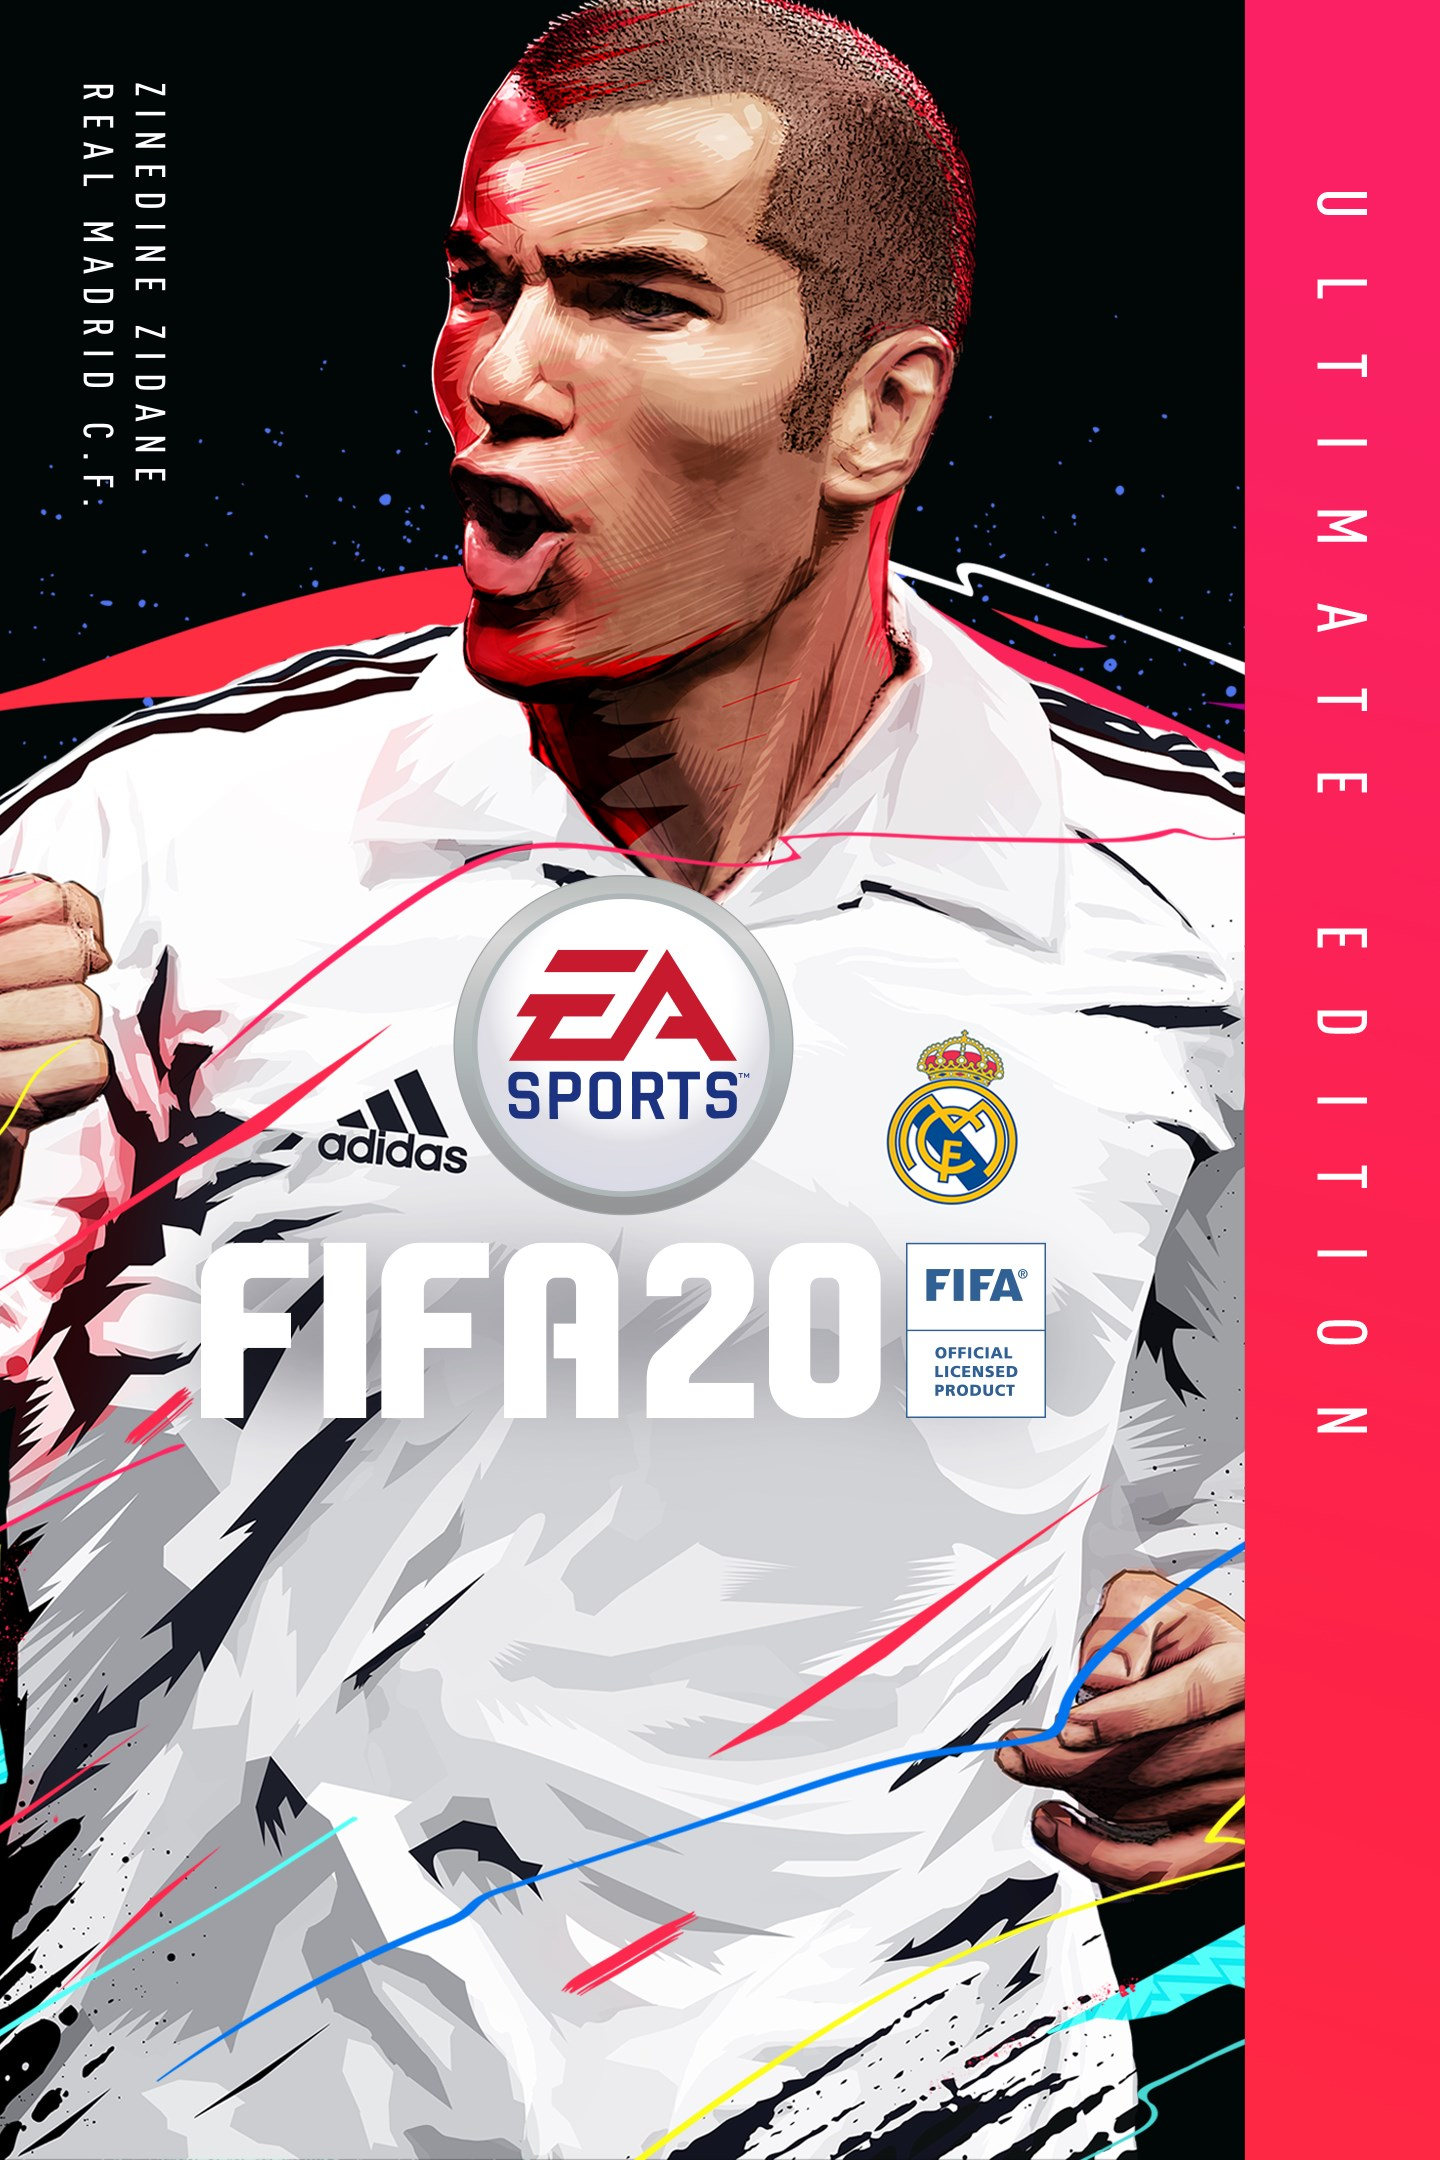 Fifa 18 trikot easports ultimate team Gr. L